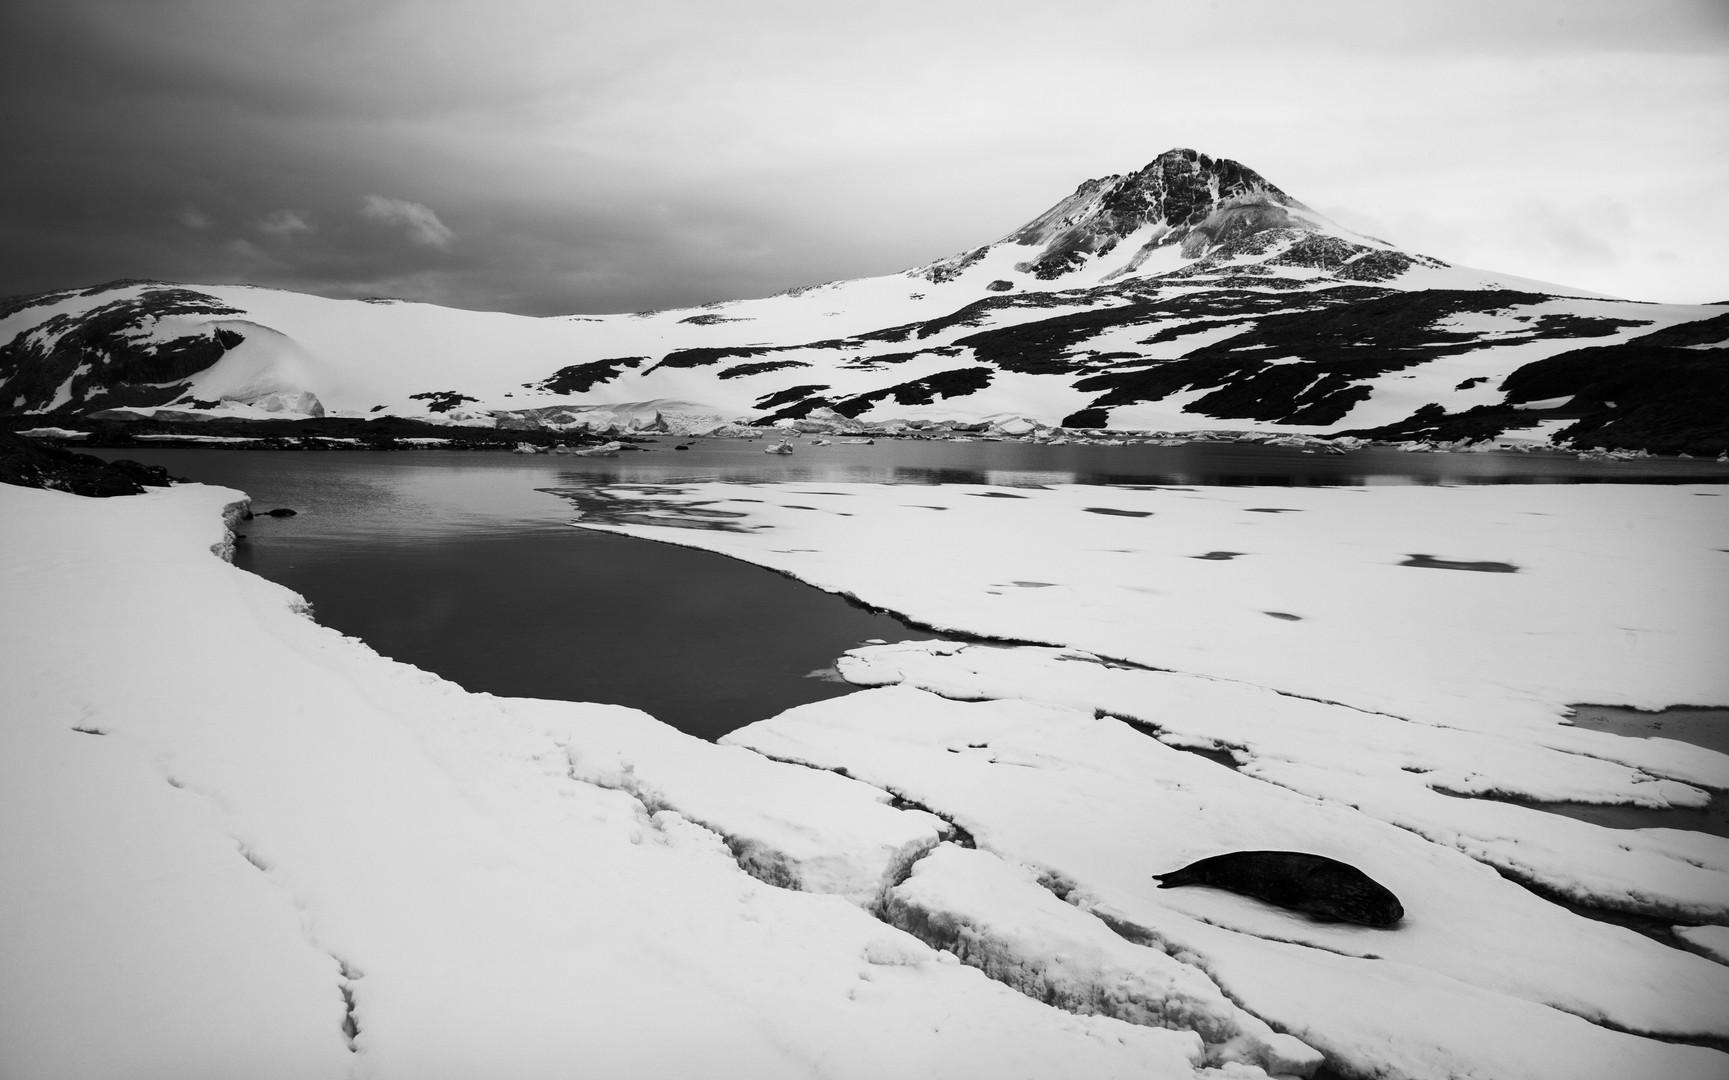 Horseshoe Island with Weddell Seal